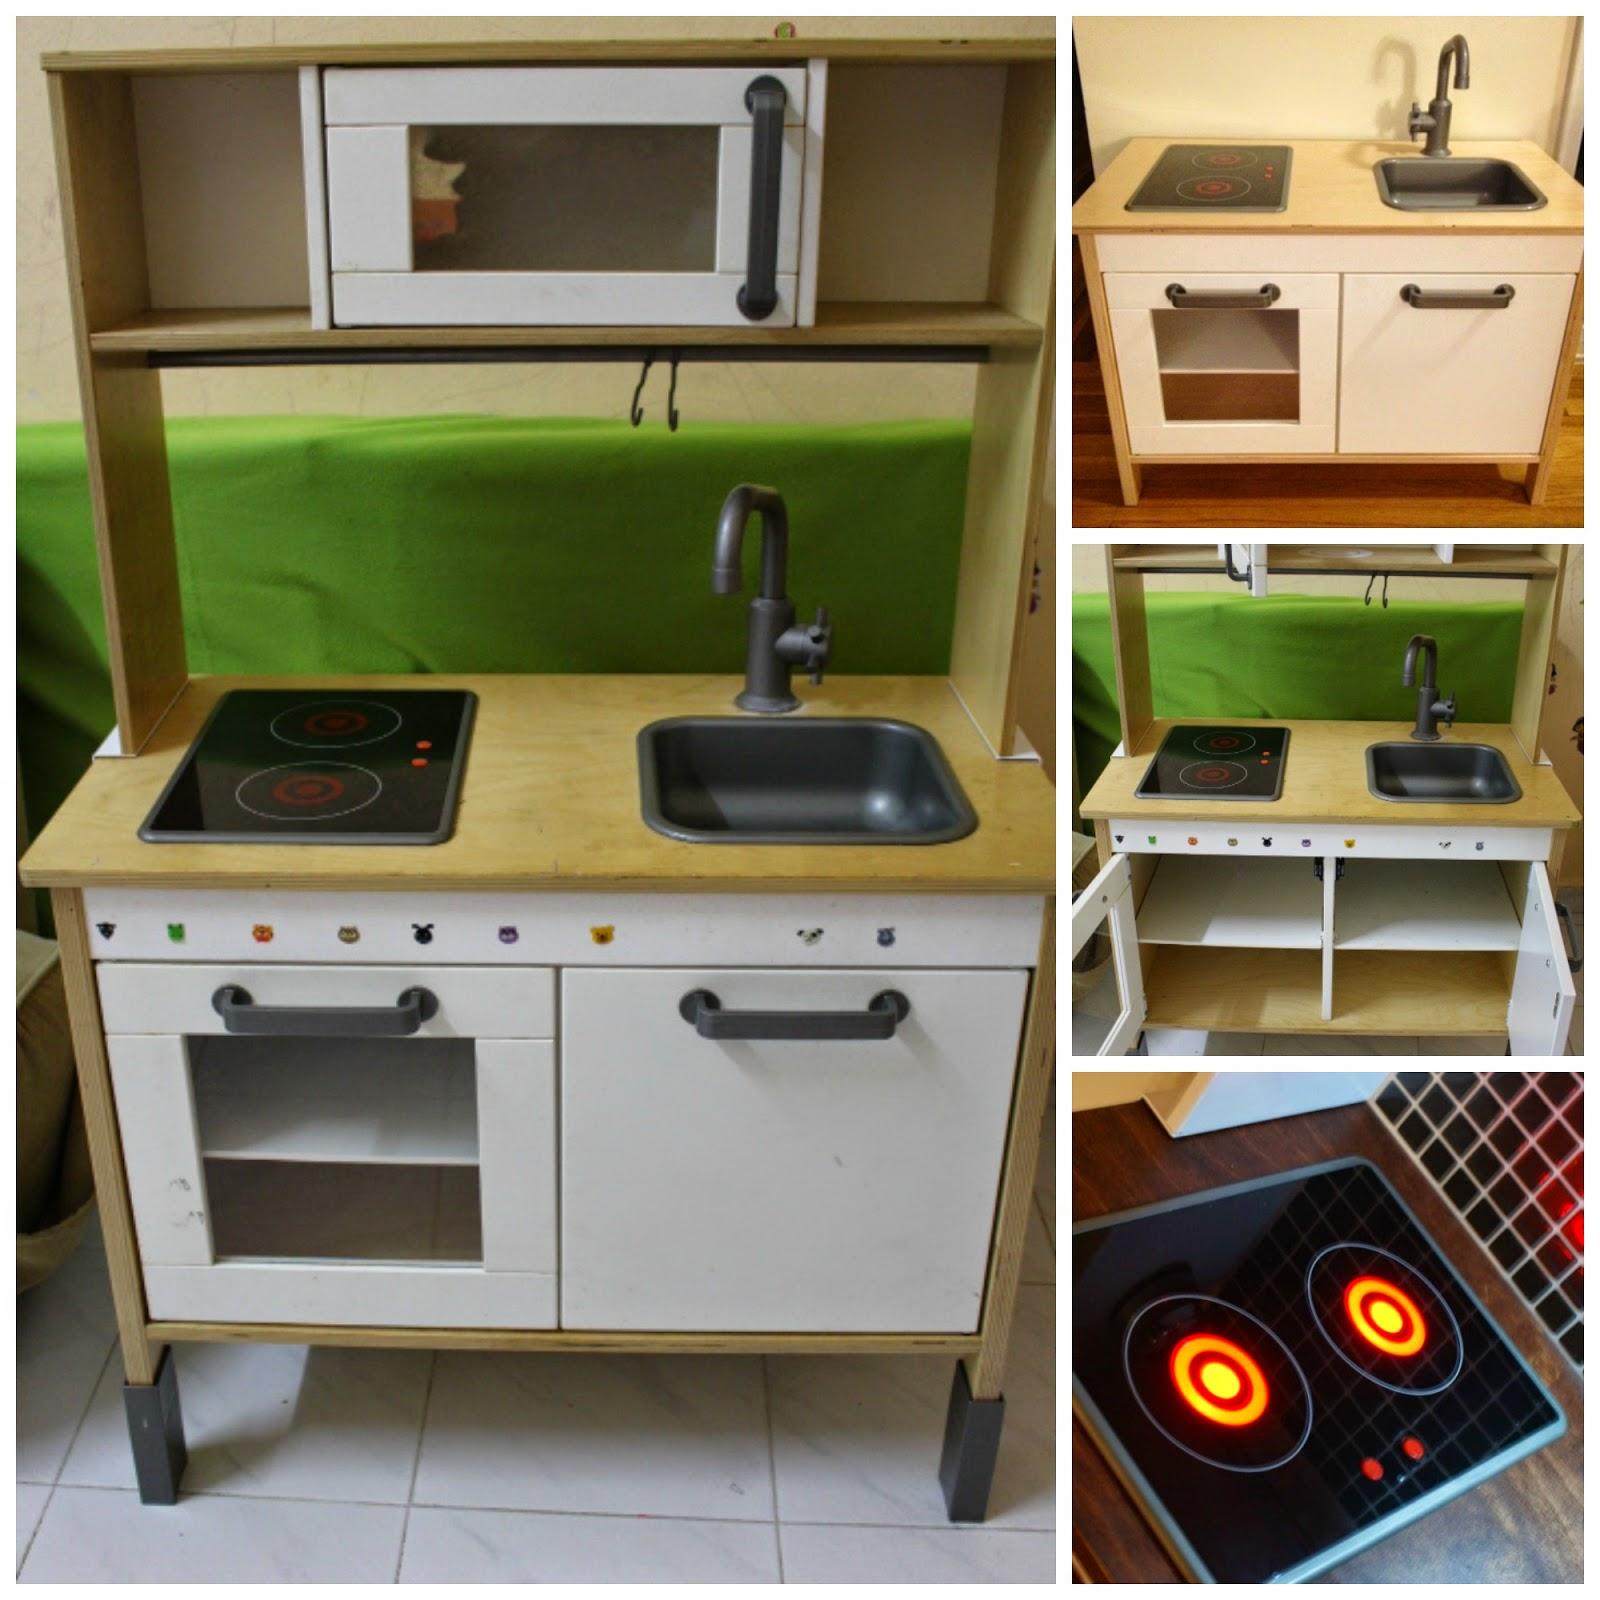 Ikea Showroom Kitchen: Amy Sweety Store: IKEA DukTiG Kitchen